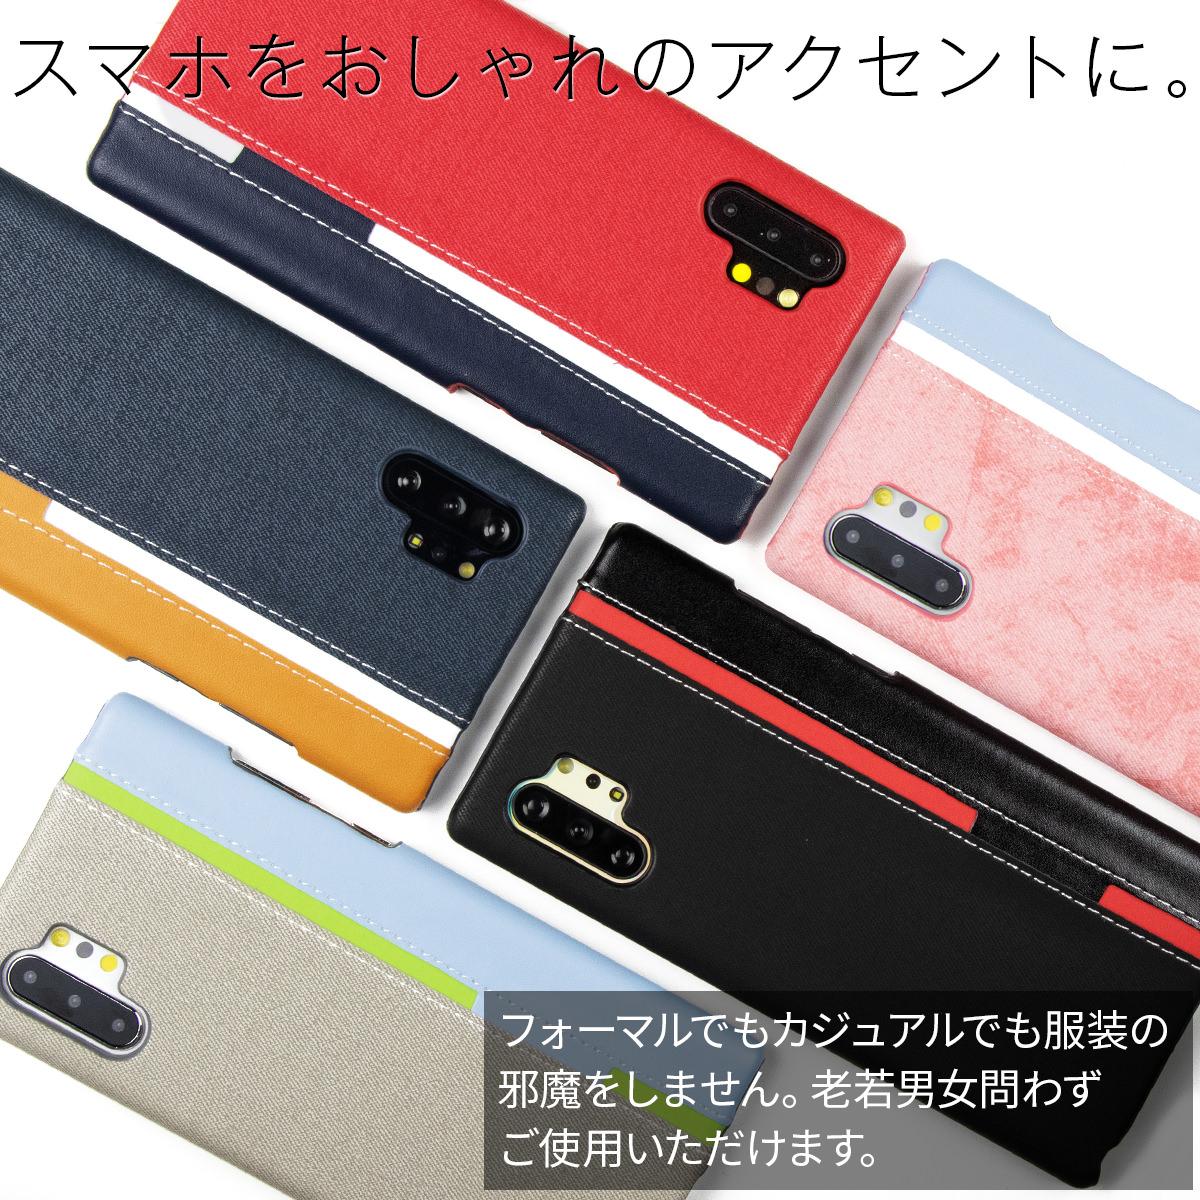 Galaxy Note10+ SC-01M SCV45 トリコロール ツートン カラー ハードケース ギャラクシー galaxy note10+ sc-01m scv45 note10プラス plus